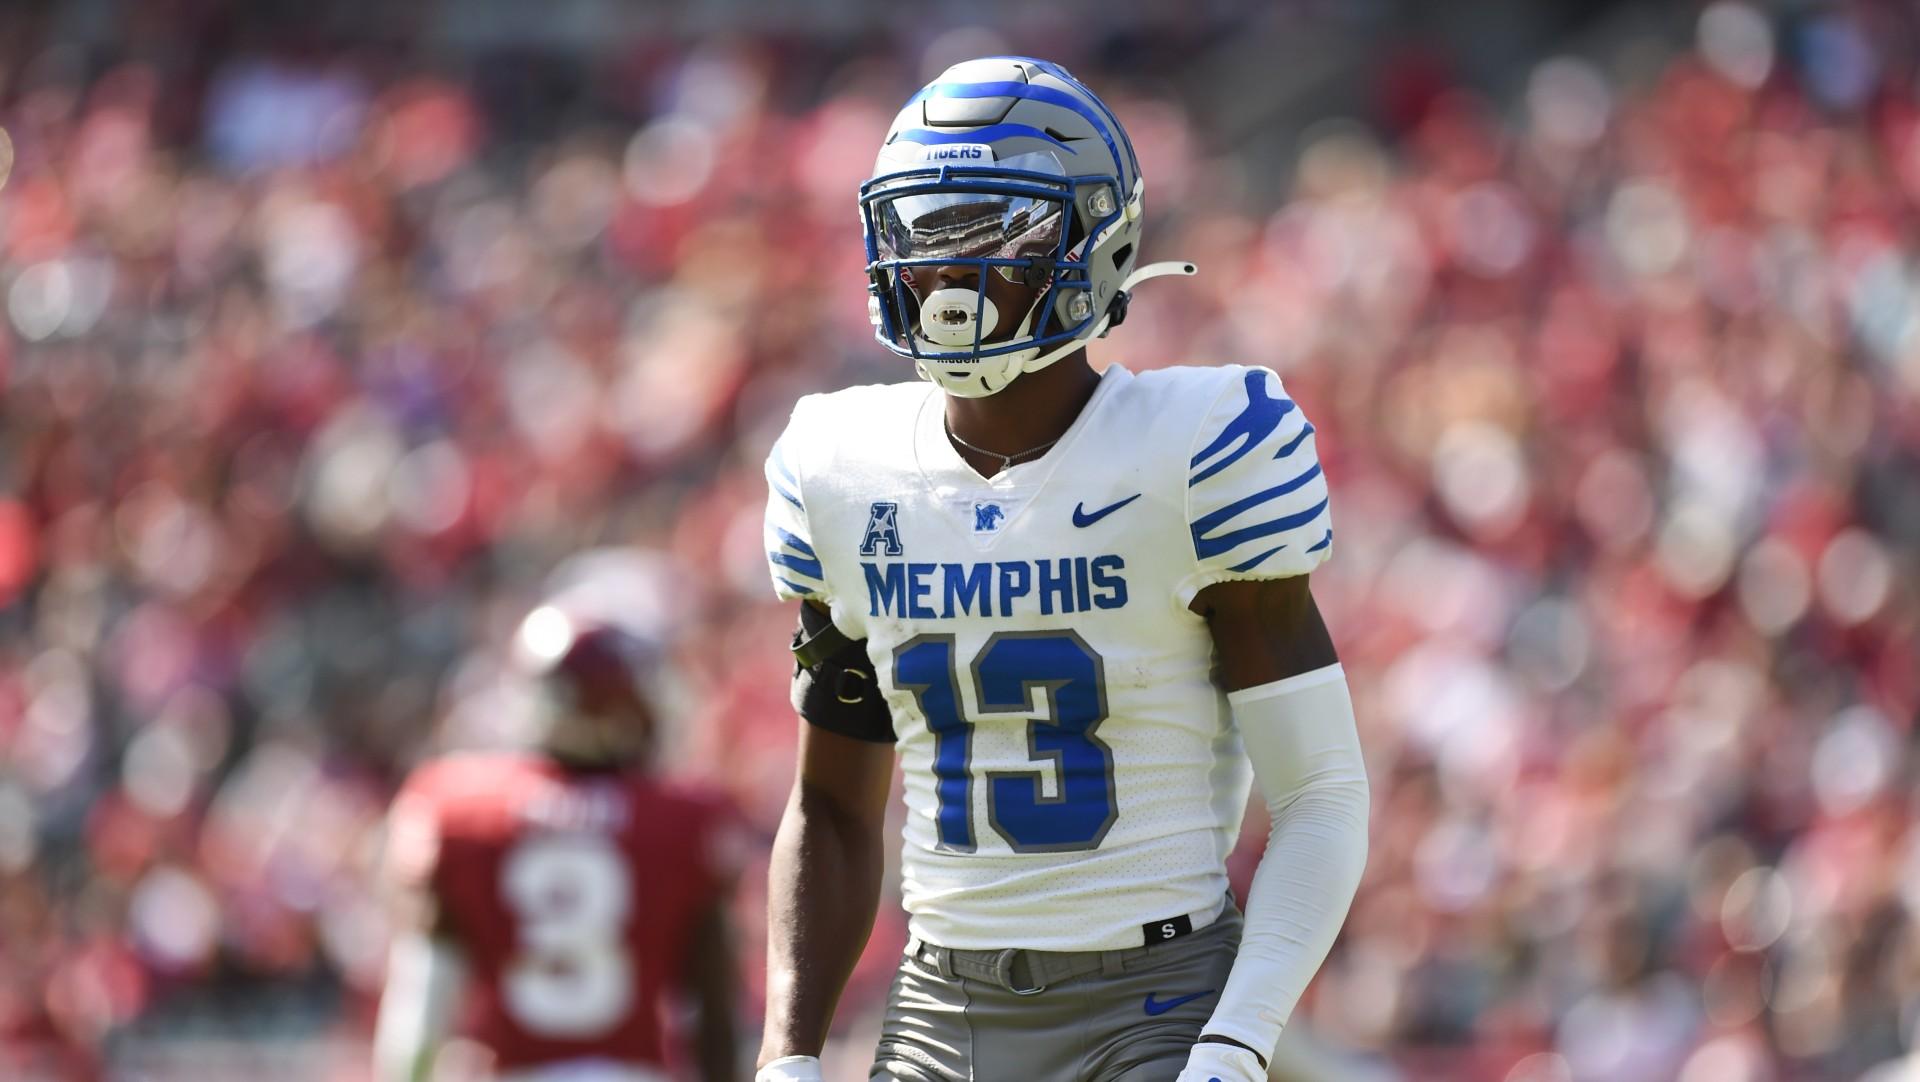 college football-odds-picks-memphis tigers vs ucf knights-friday, october-22